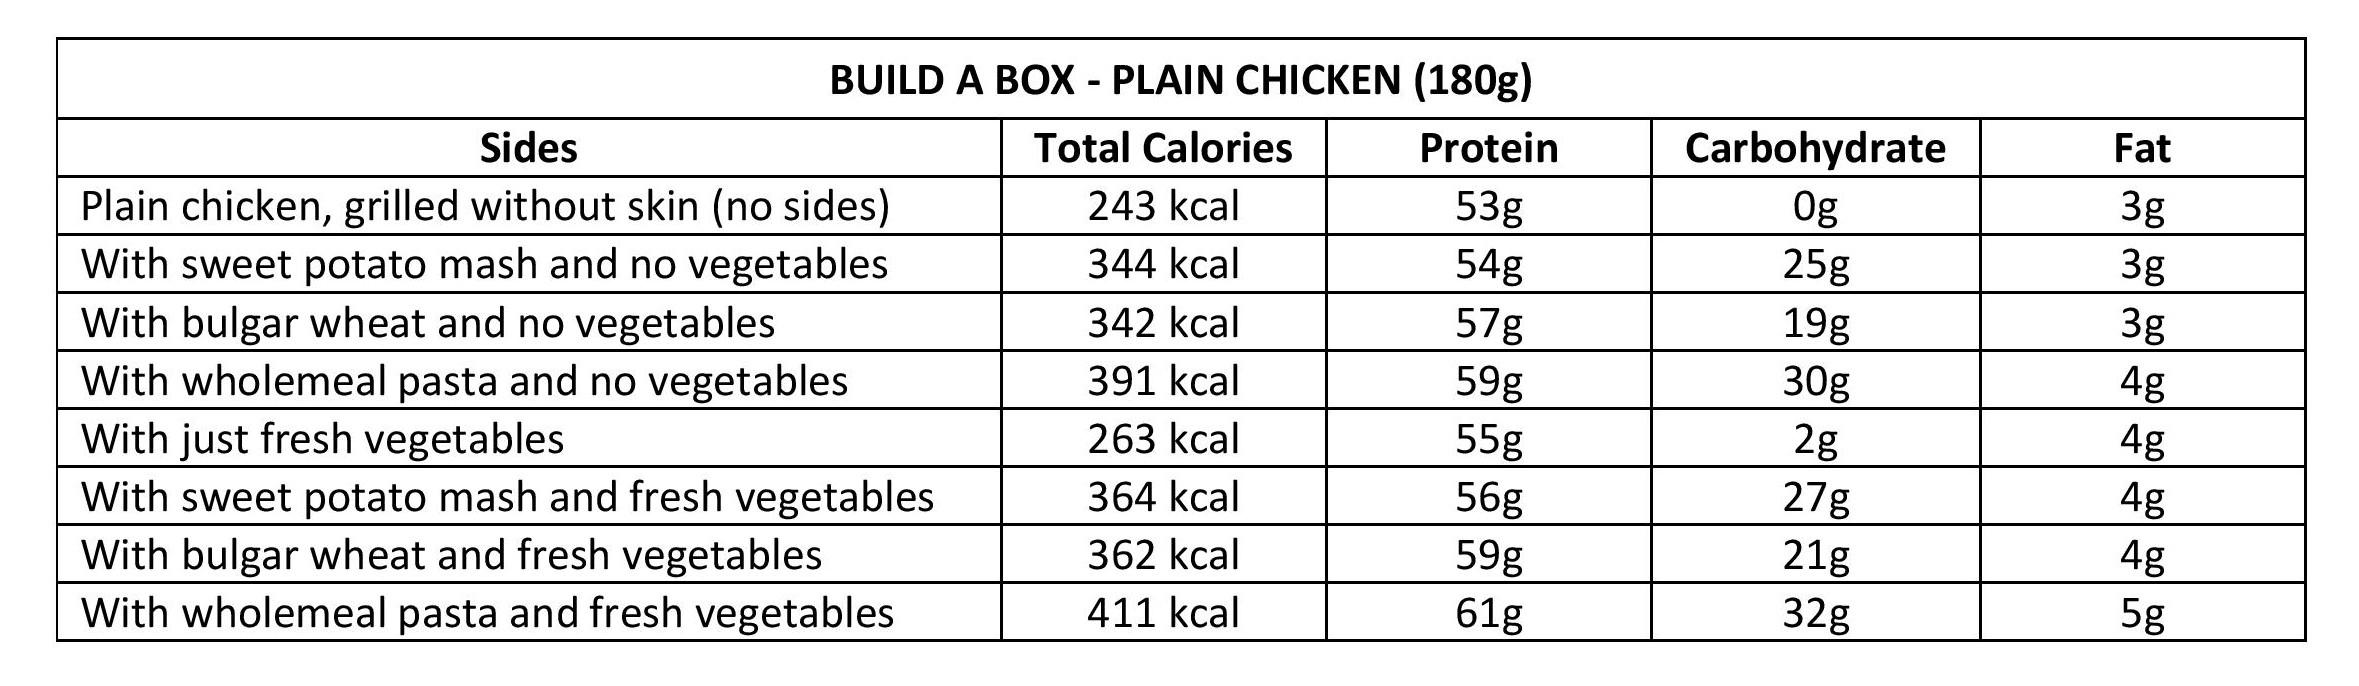 Plain Chicken Nutritional Values